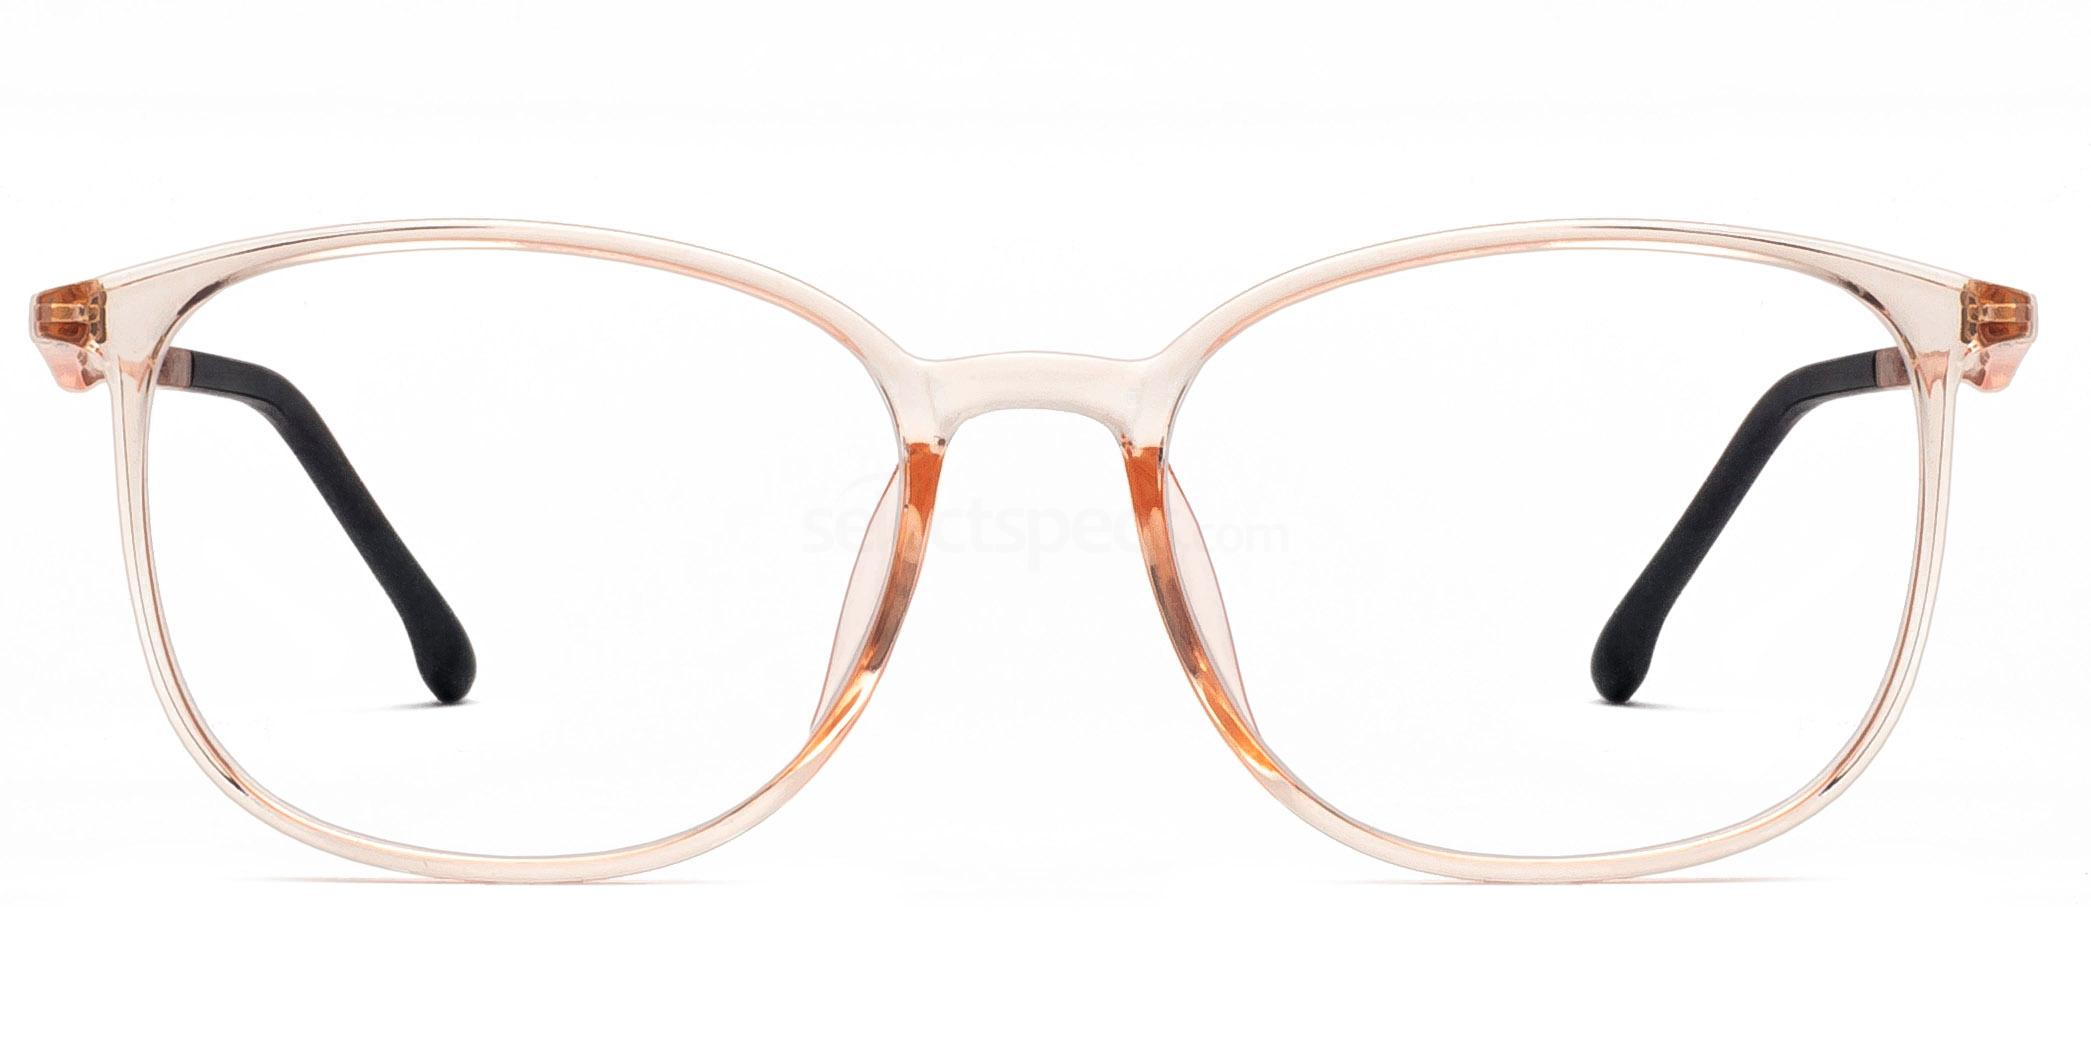 AW20 eyewear trends transparent glasses warm tones orange